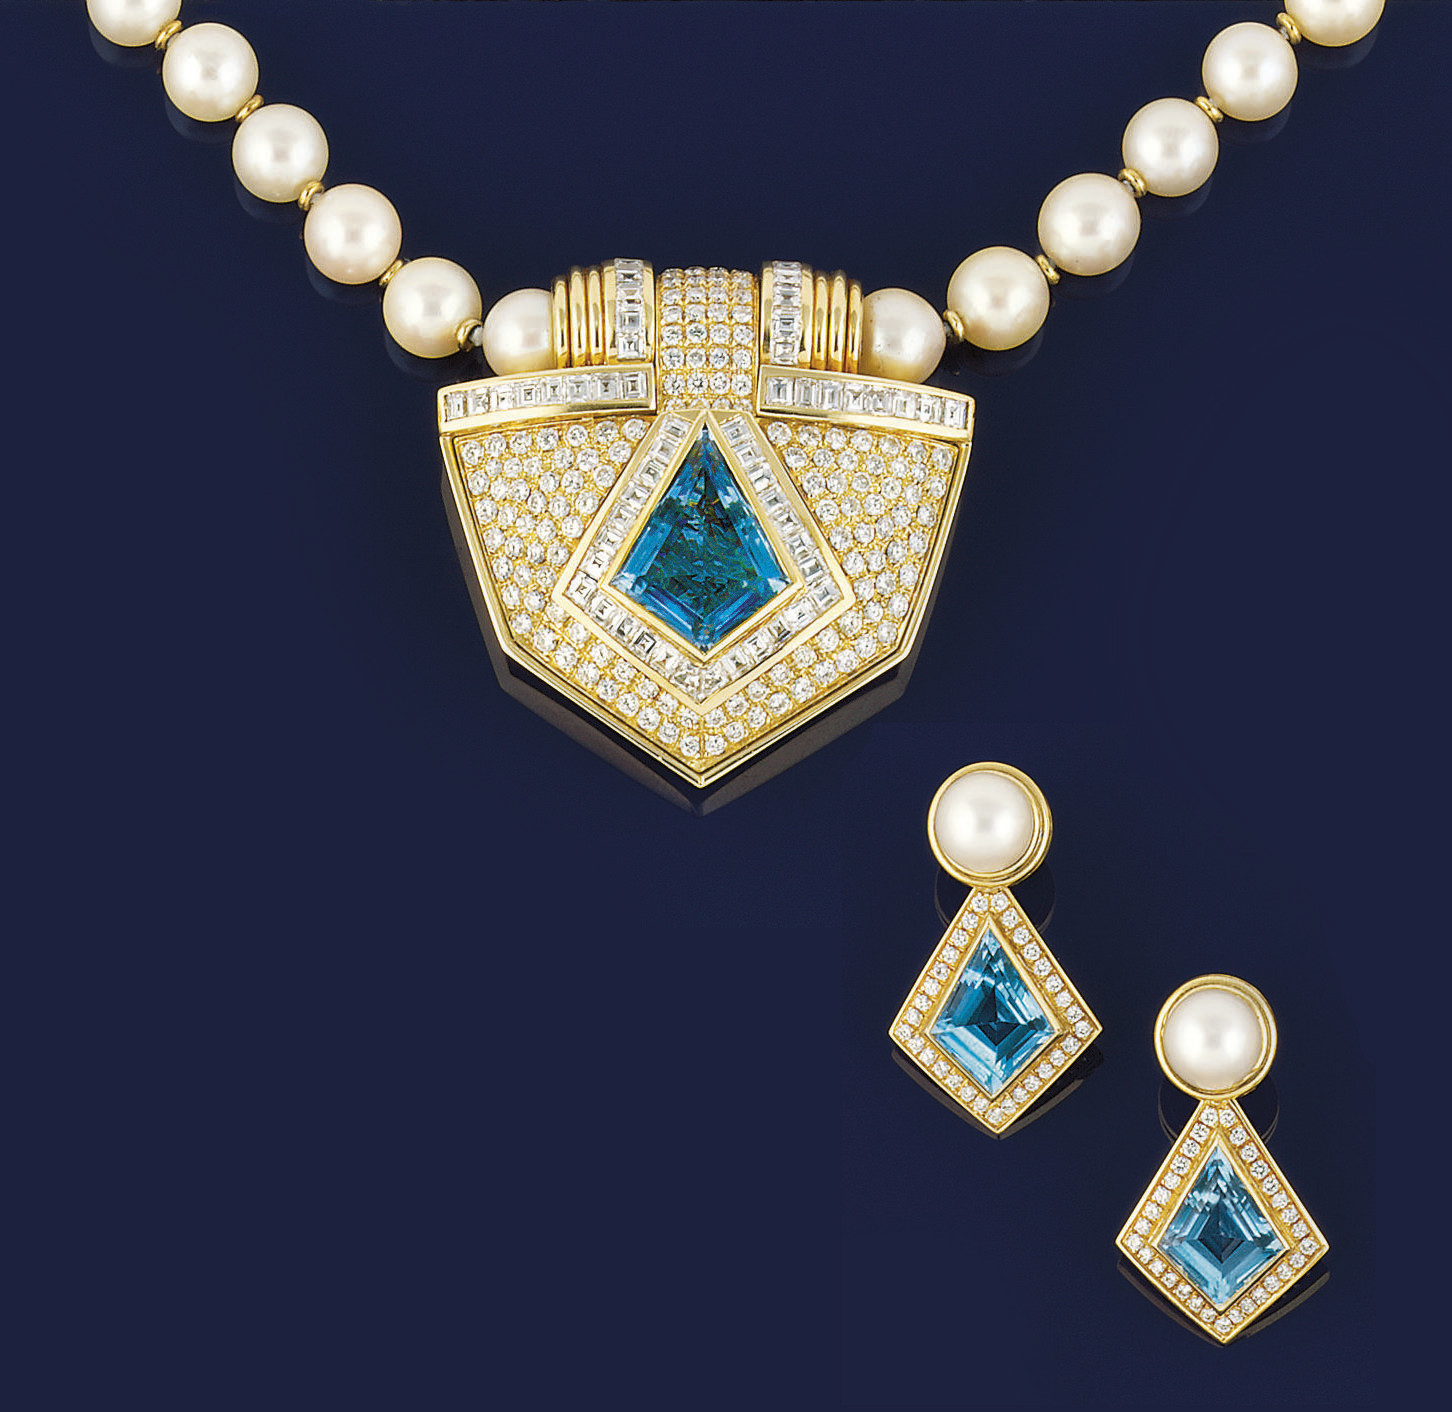 A DIAMOND, BLUE TOPAZ AND CULT